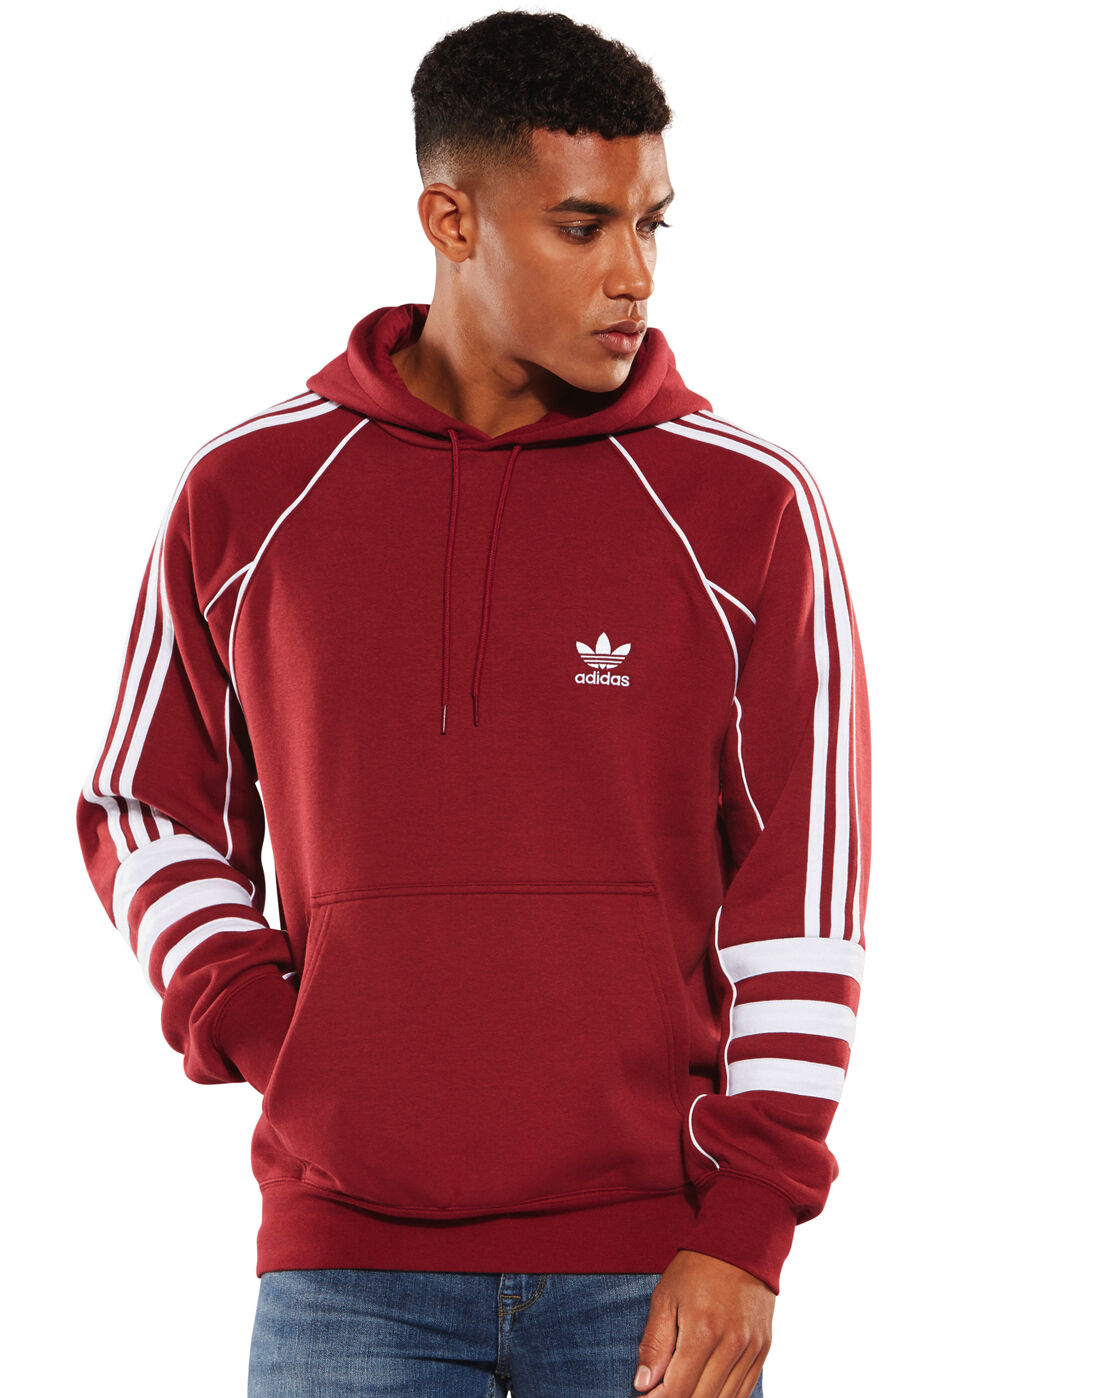 adidas Originals Authentic Hooded Sweatshirt